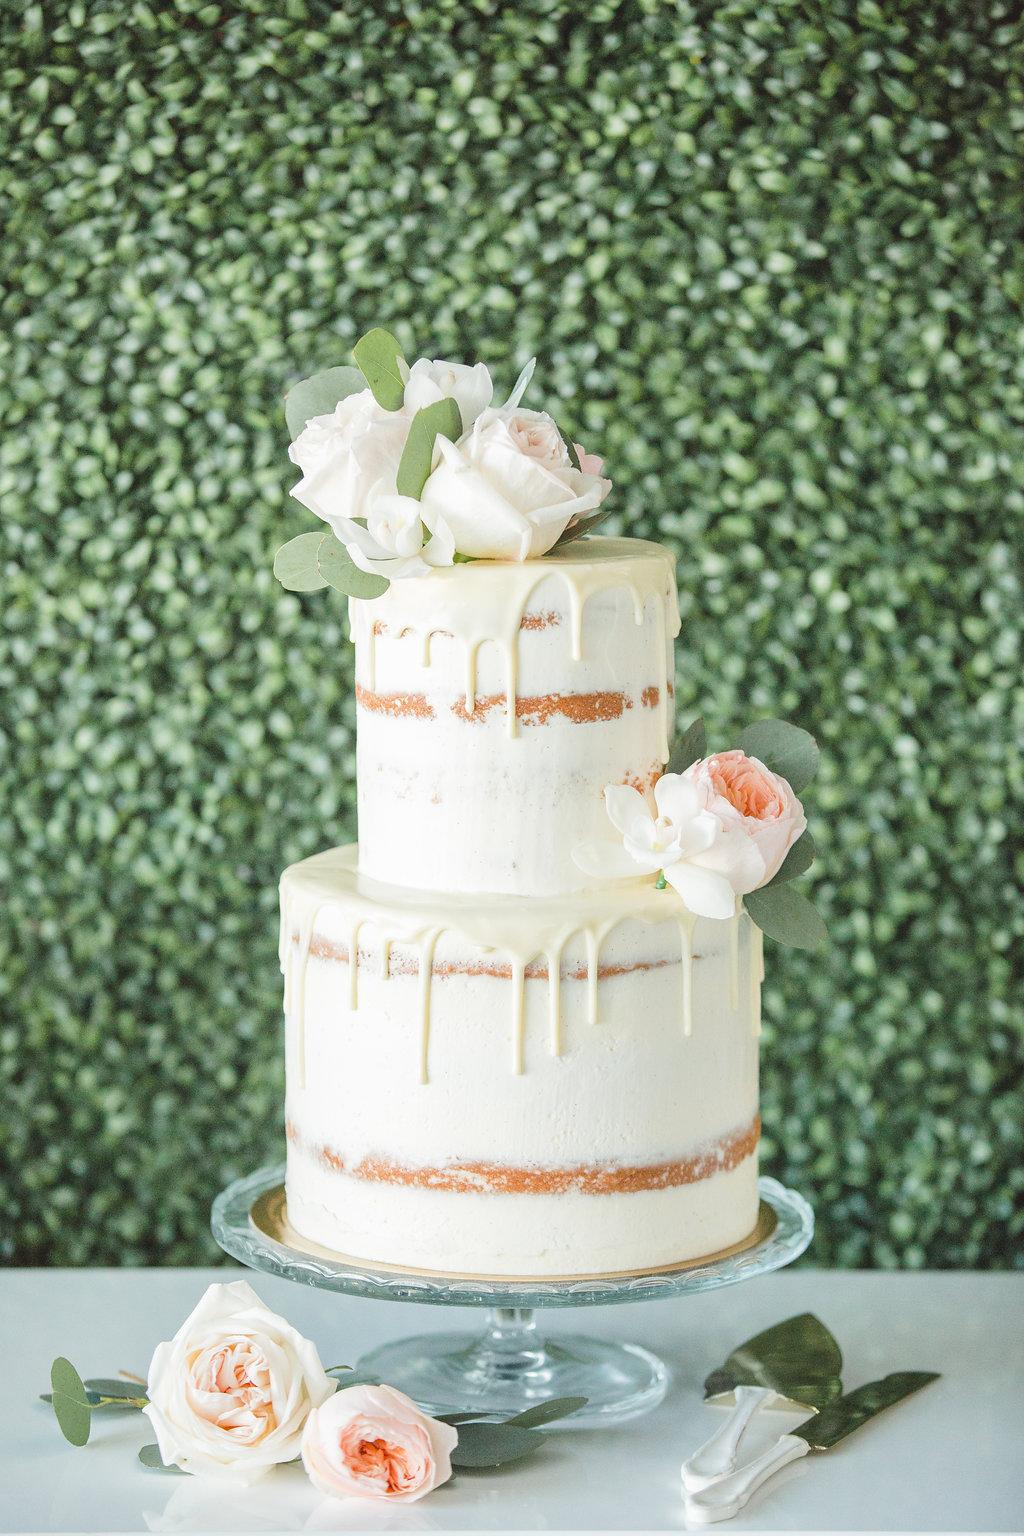 naked drip wedding cake - photo by Parrish House Photos https://ruffledblog.com/hawaiian-inspired-bridal-shower